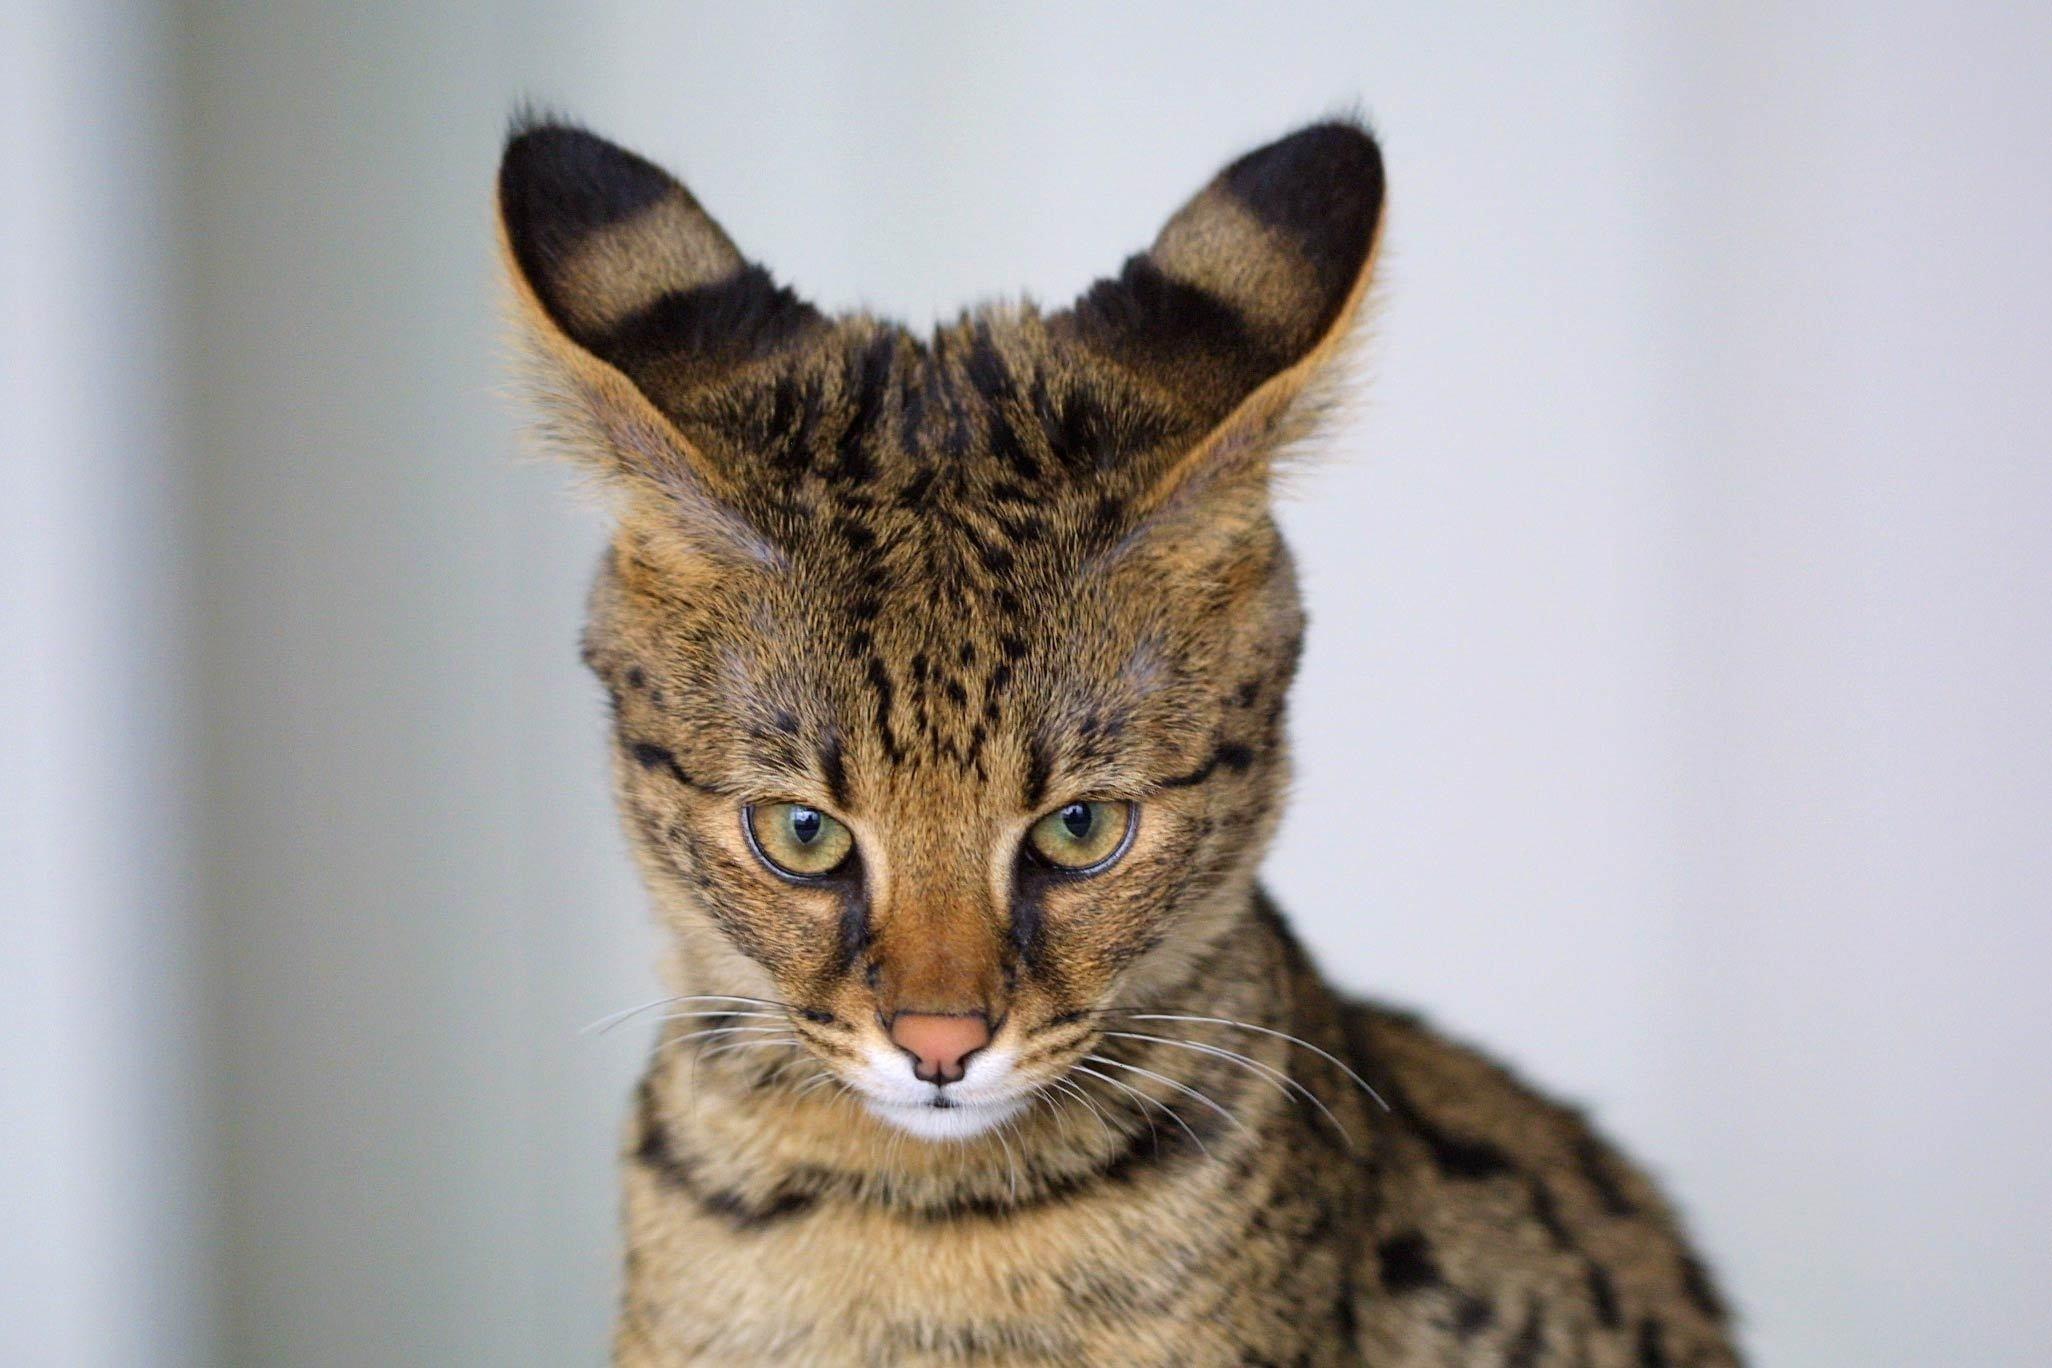 Animals___Cats_Savannah_cat_dissatisfied